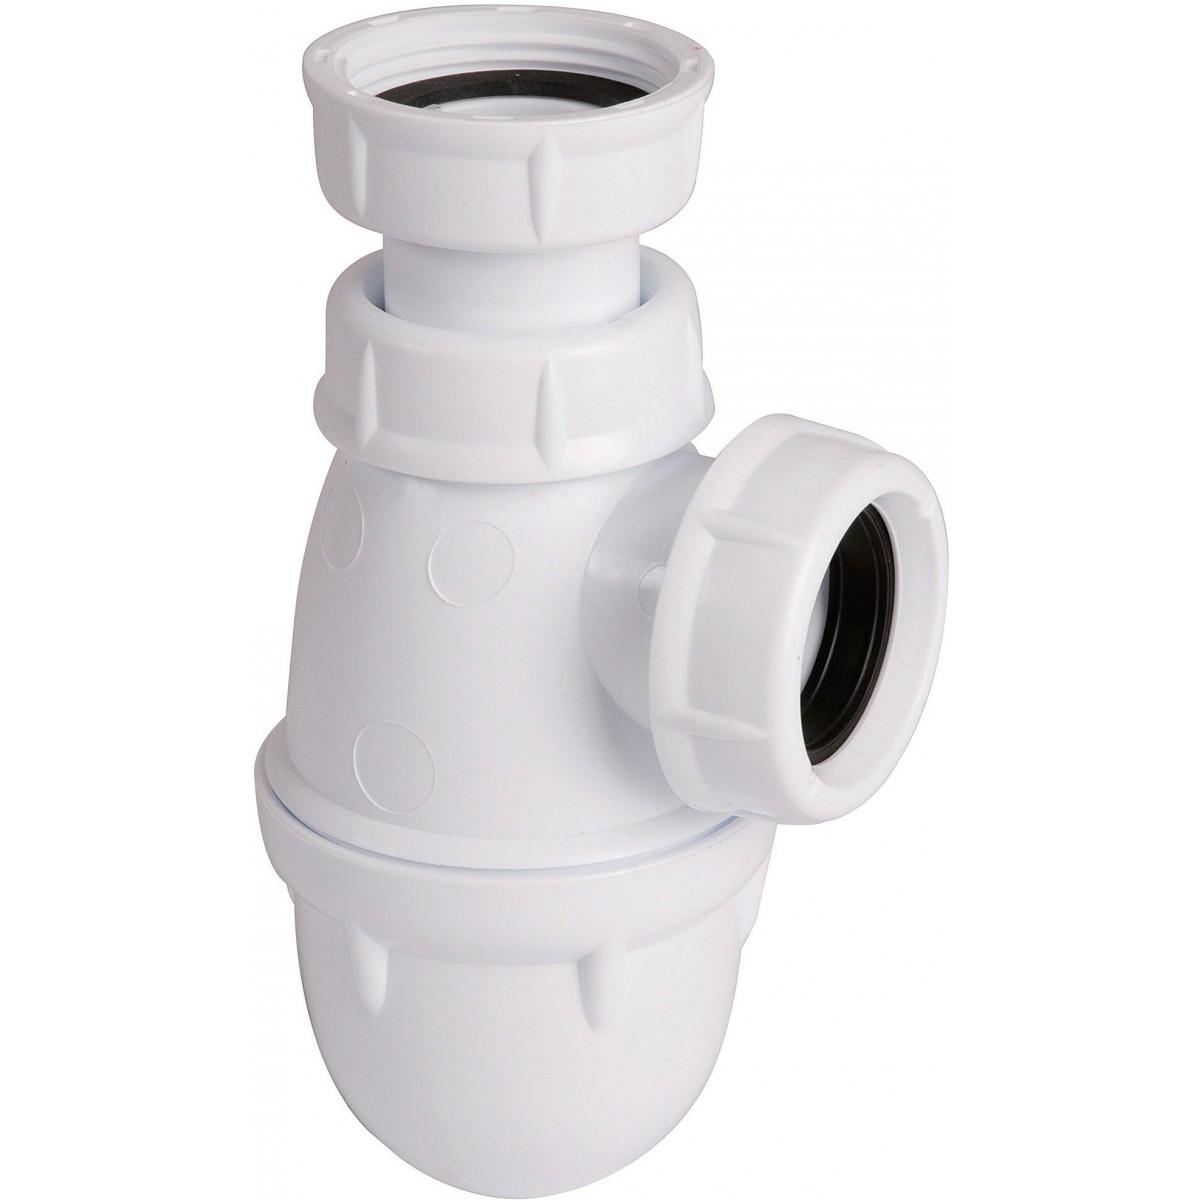 Siphon lavabo réglable 1''1/4 laiton Valentin - Diamètre 40 mm